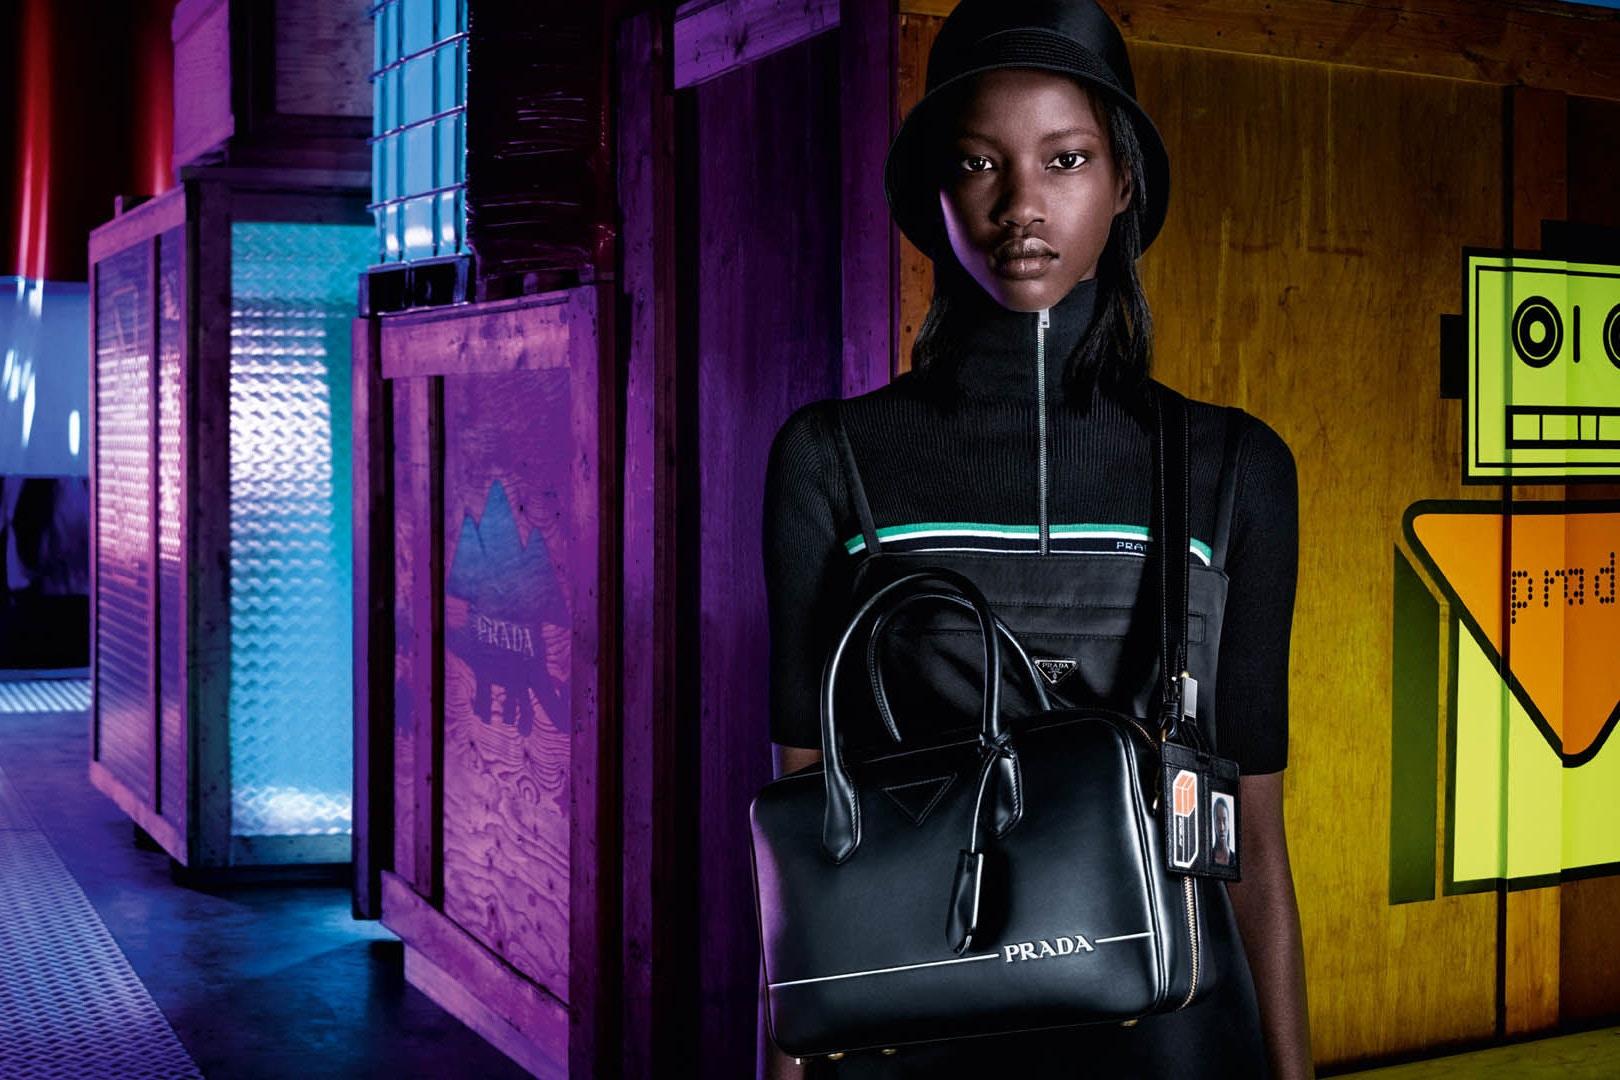 Prada Pre-Fall 2018 Campaign